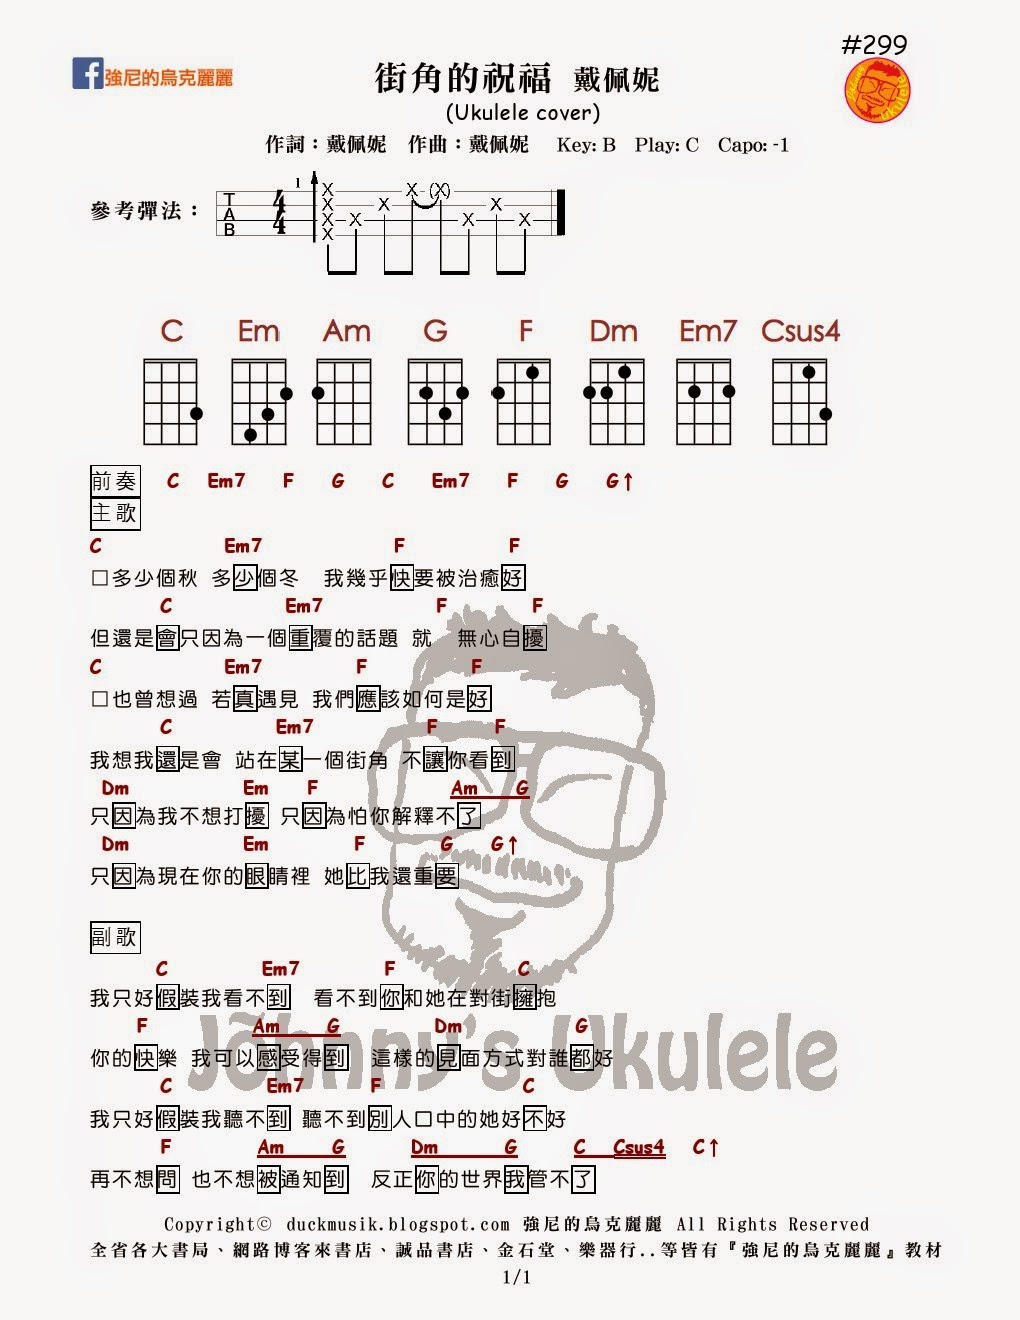 強尼的烏克麗麗 Johnny Ukulele音樂教室: #307 See You Again 玩命關頭7 ...